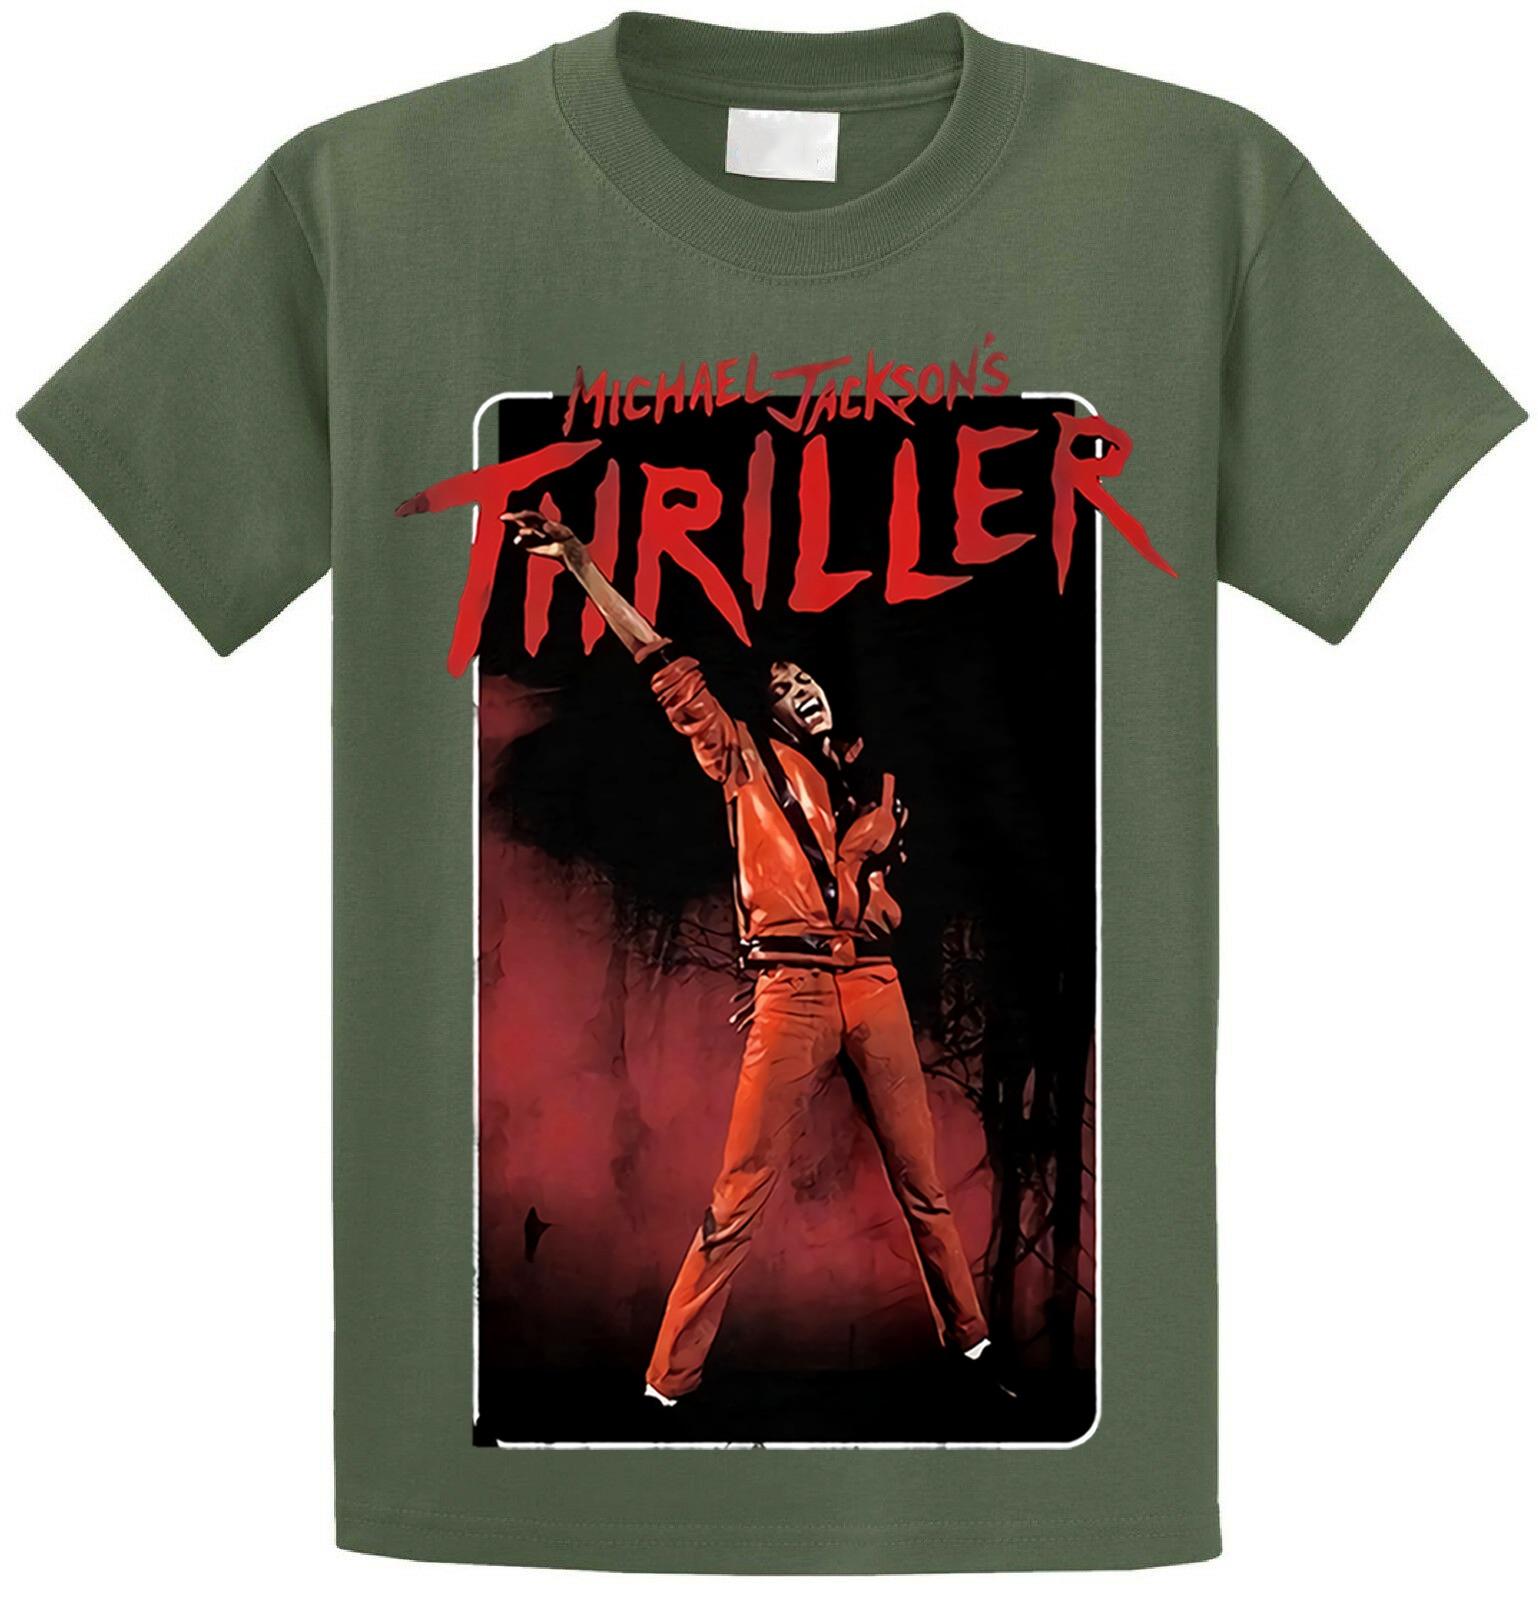 Michael Jackson Thriller Pose de danza offiziell de manera camiseta Herren hombres camiseta Camisa de algodón de manga corta Fitness camisetas